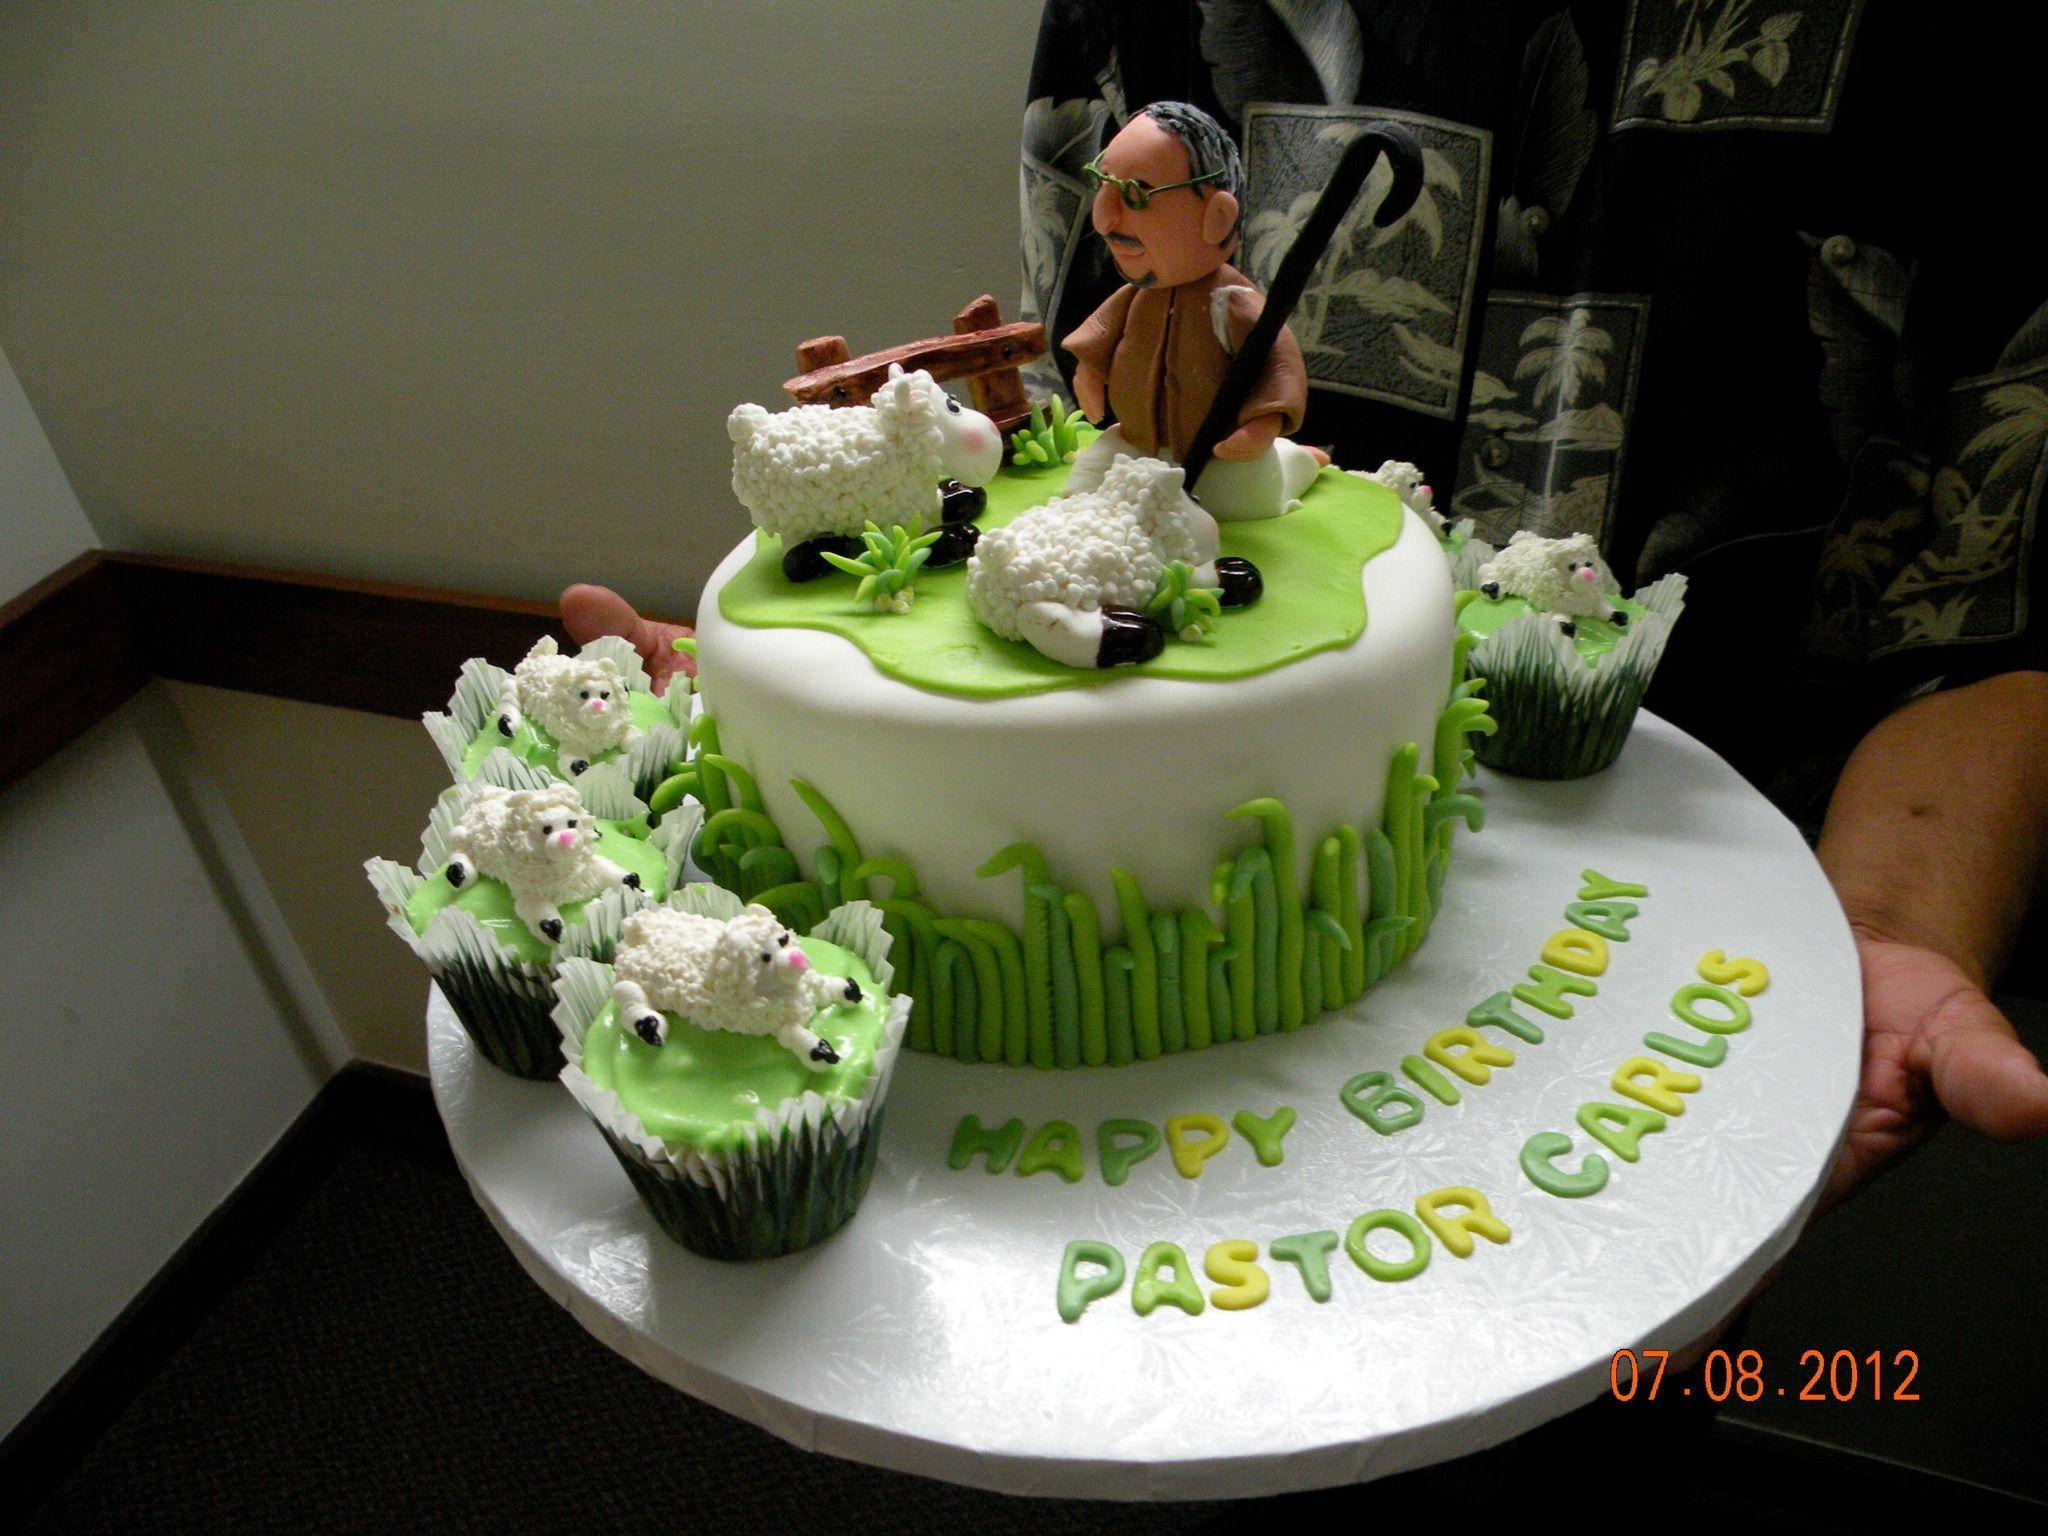 pastors birthday cake